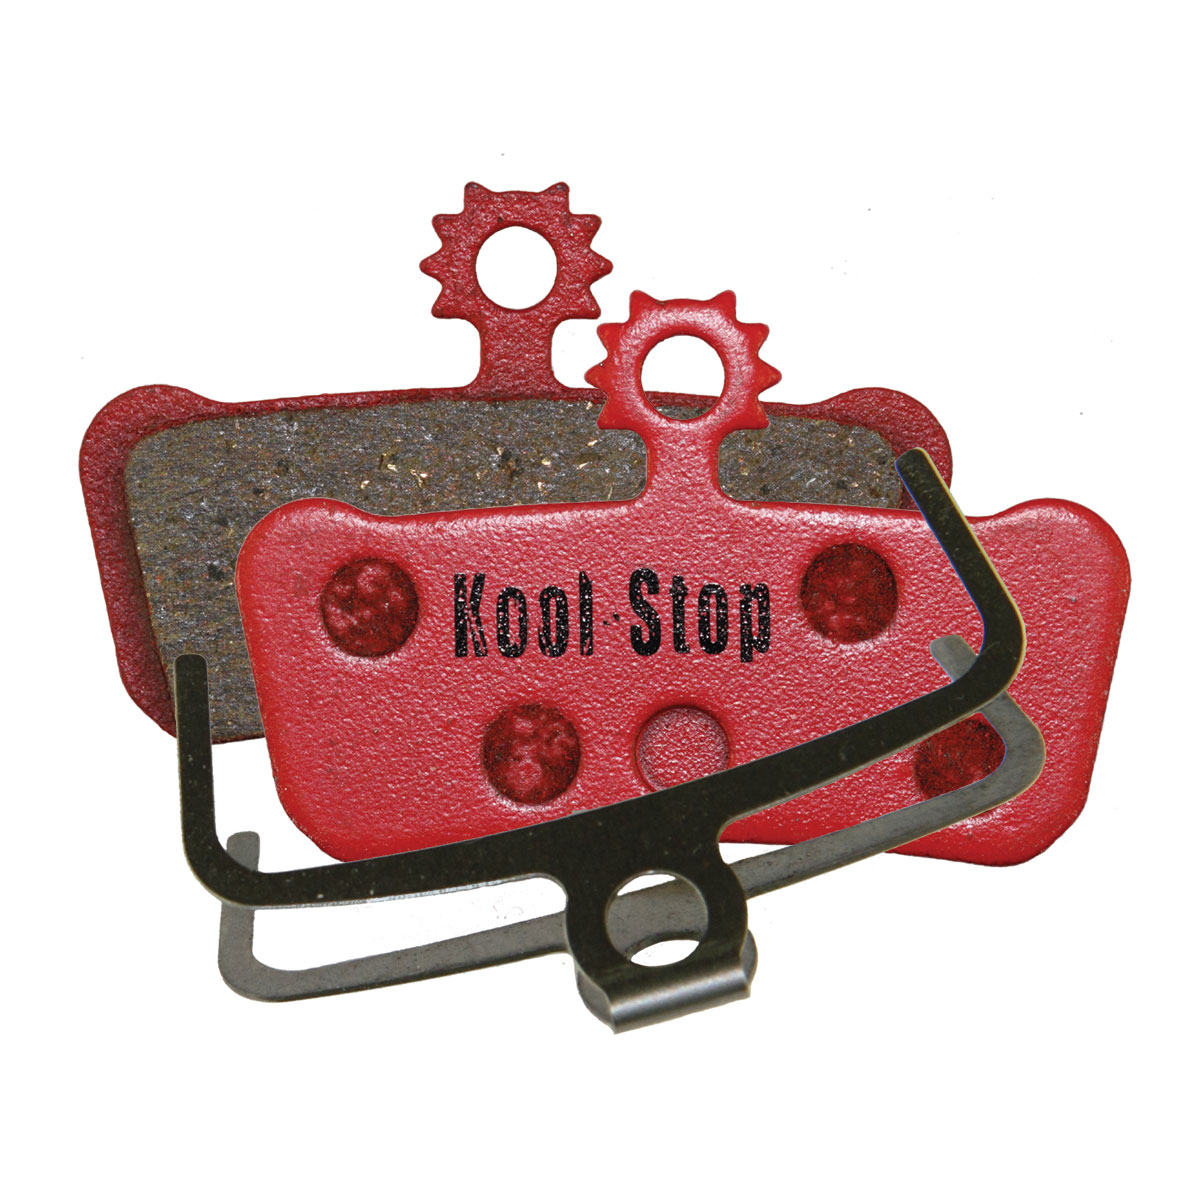 Destičky brzdové Kool Stop AVID XO Trail, Elixir 7/9, Sram GUIDE R/RS/RSC